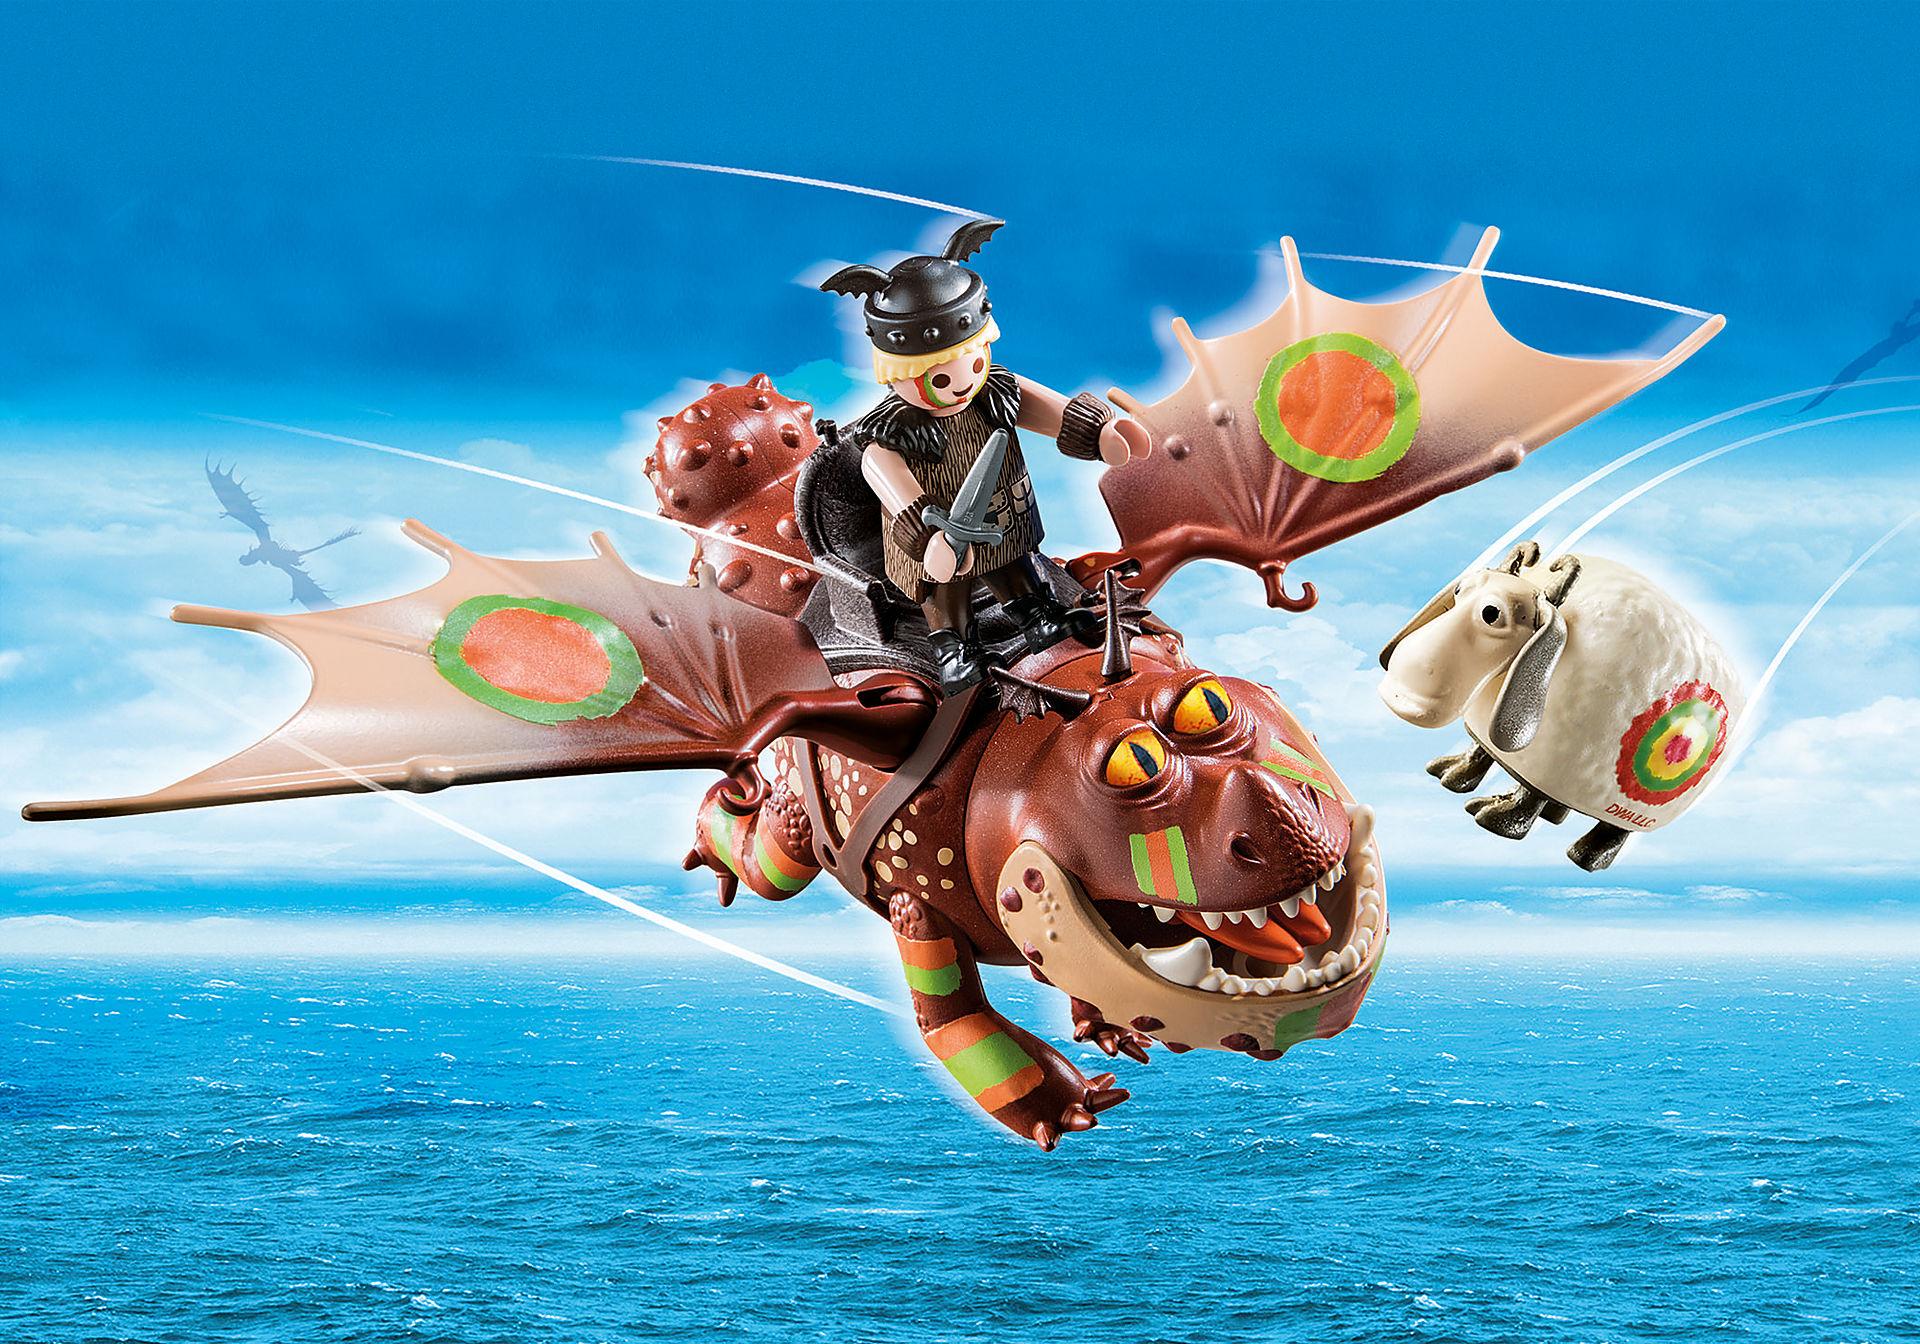 70729 Dragon Racing: Fishlegs and Meatlug  zoom image1